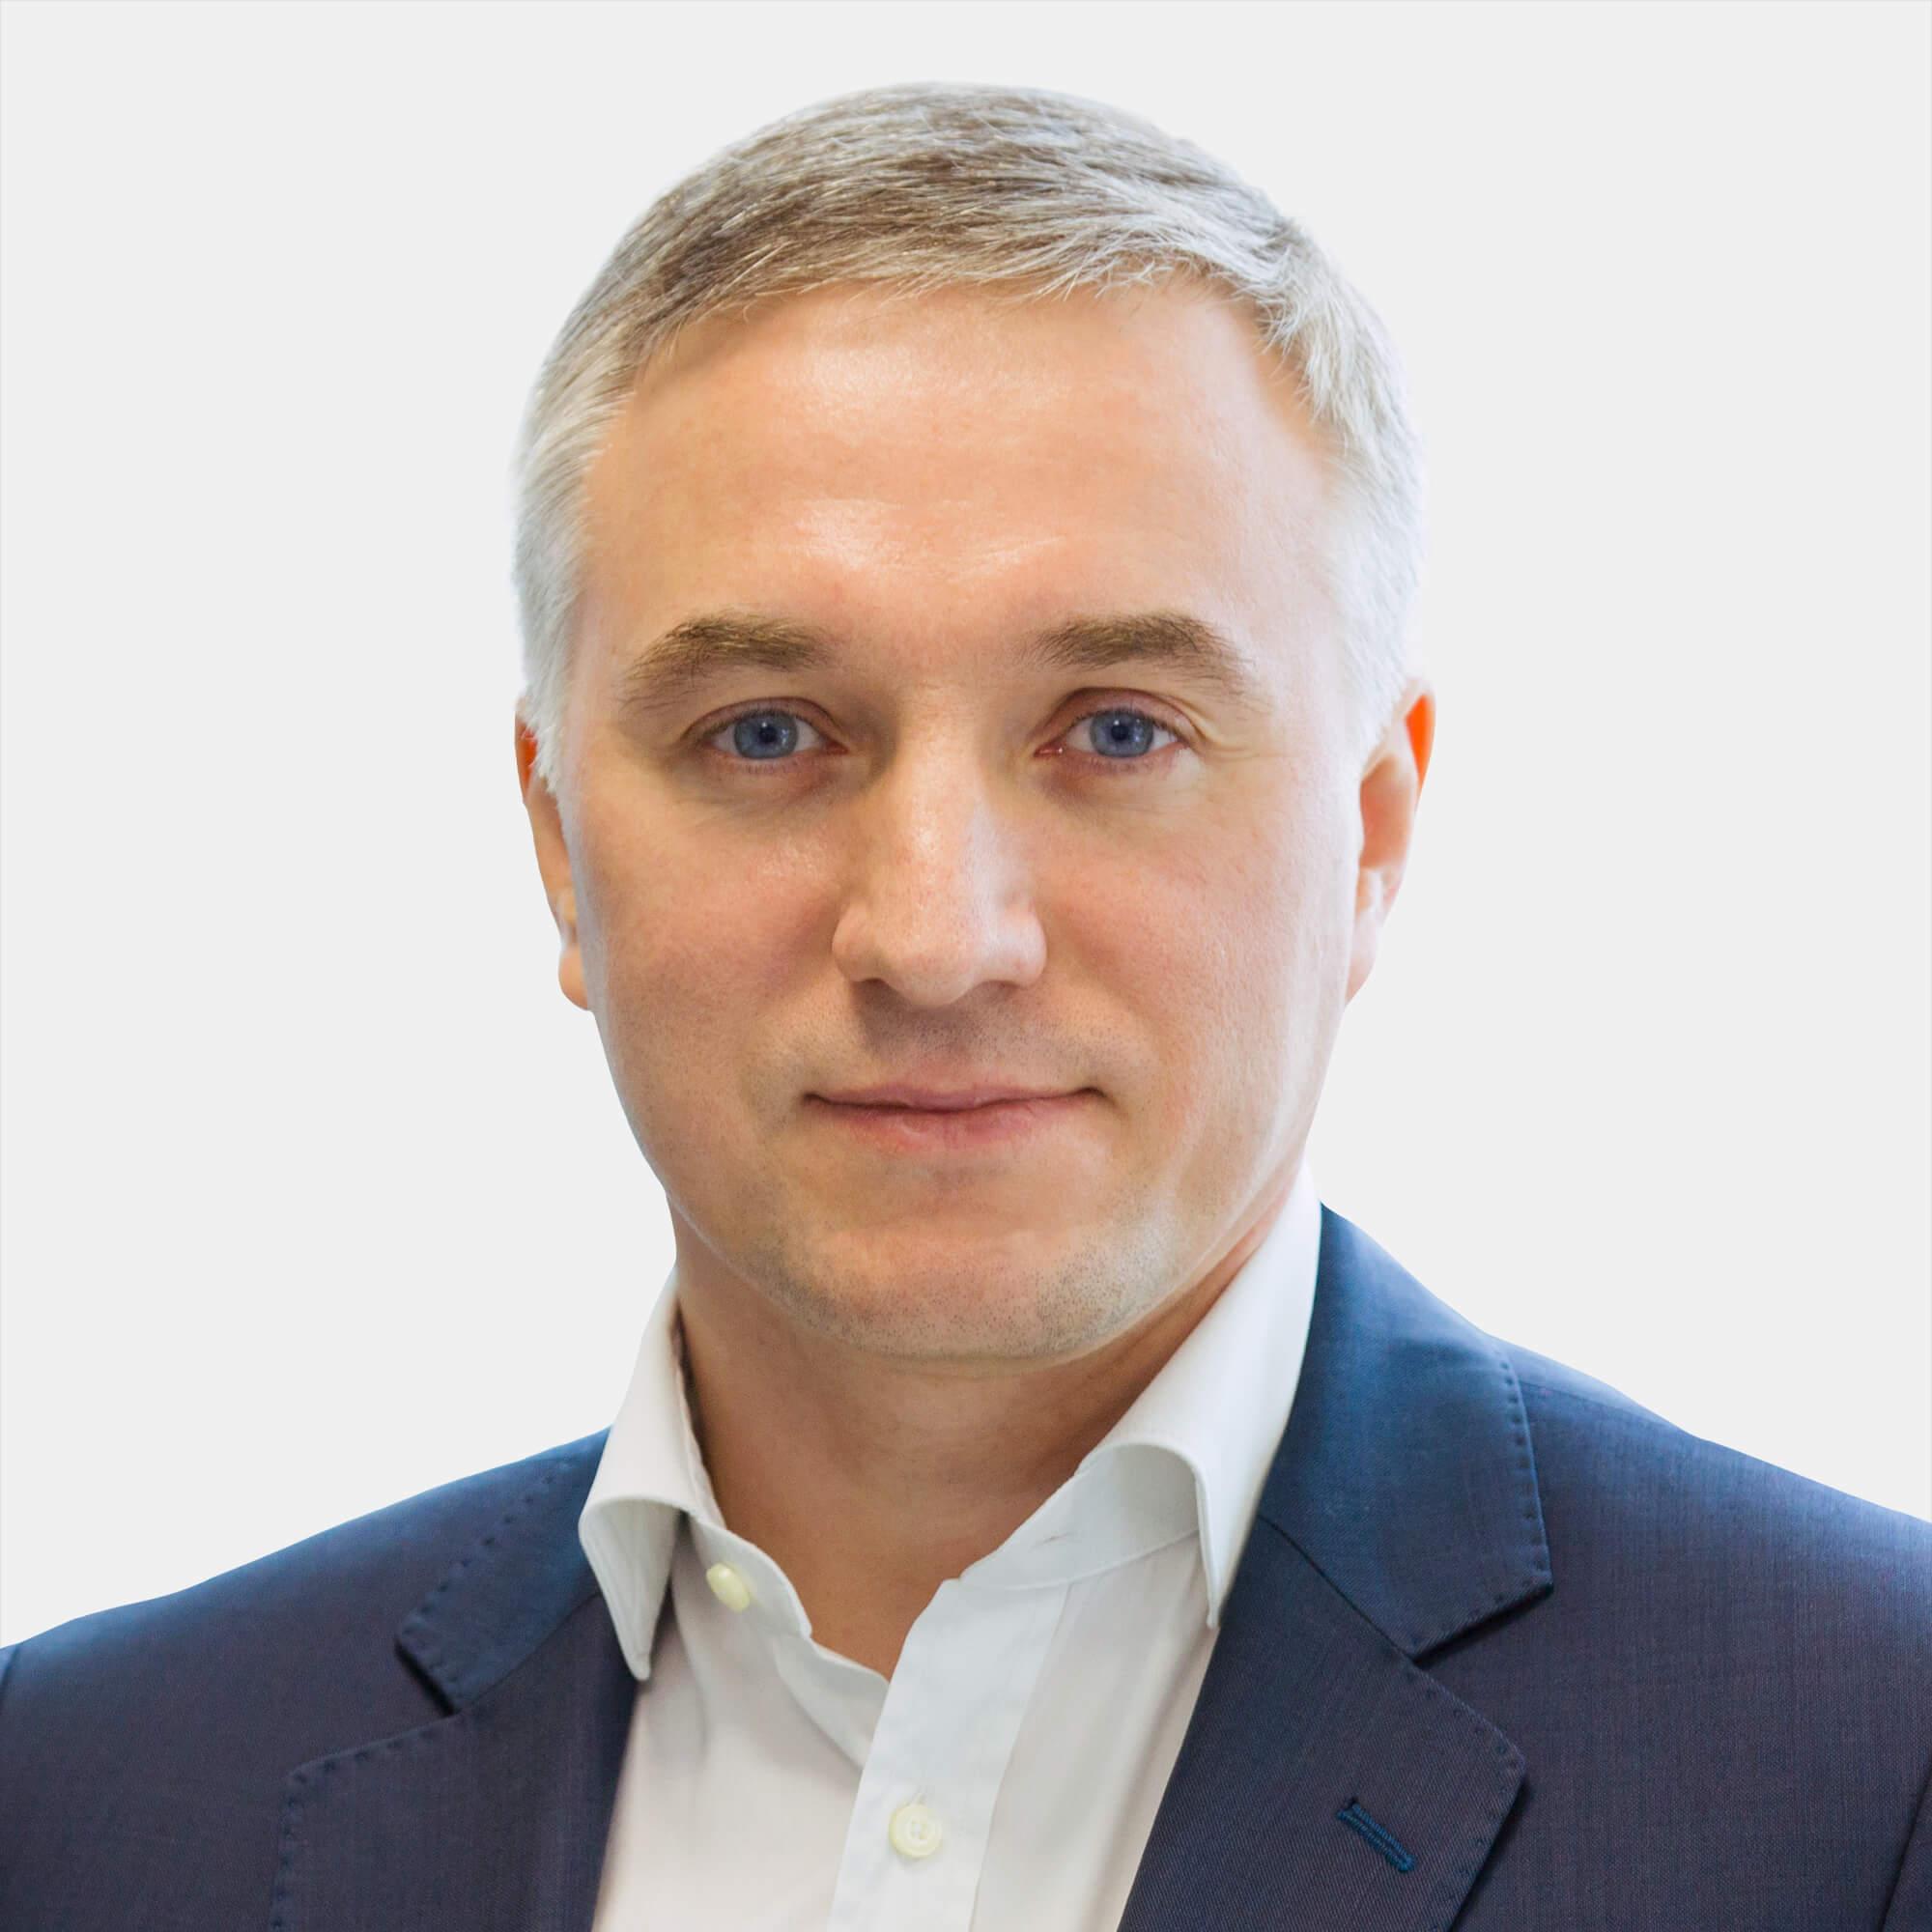 Dmitry Kaminskiy - Co-Founder, Longevity International, Head of International Development